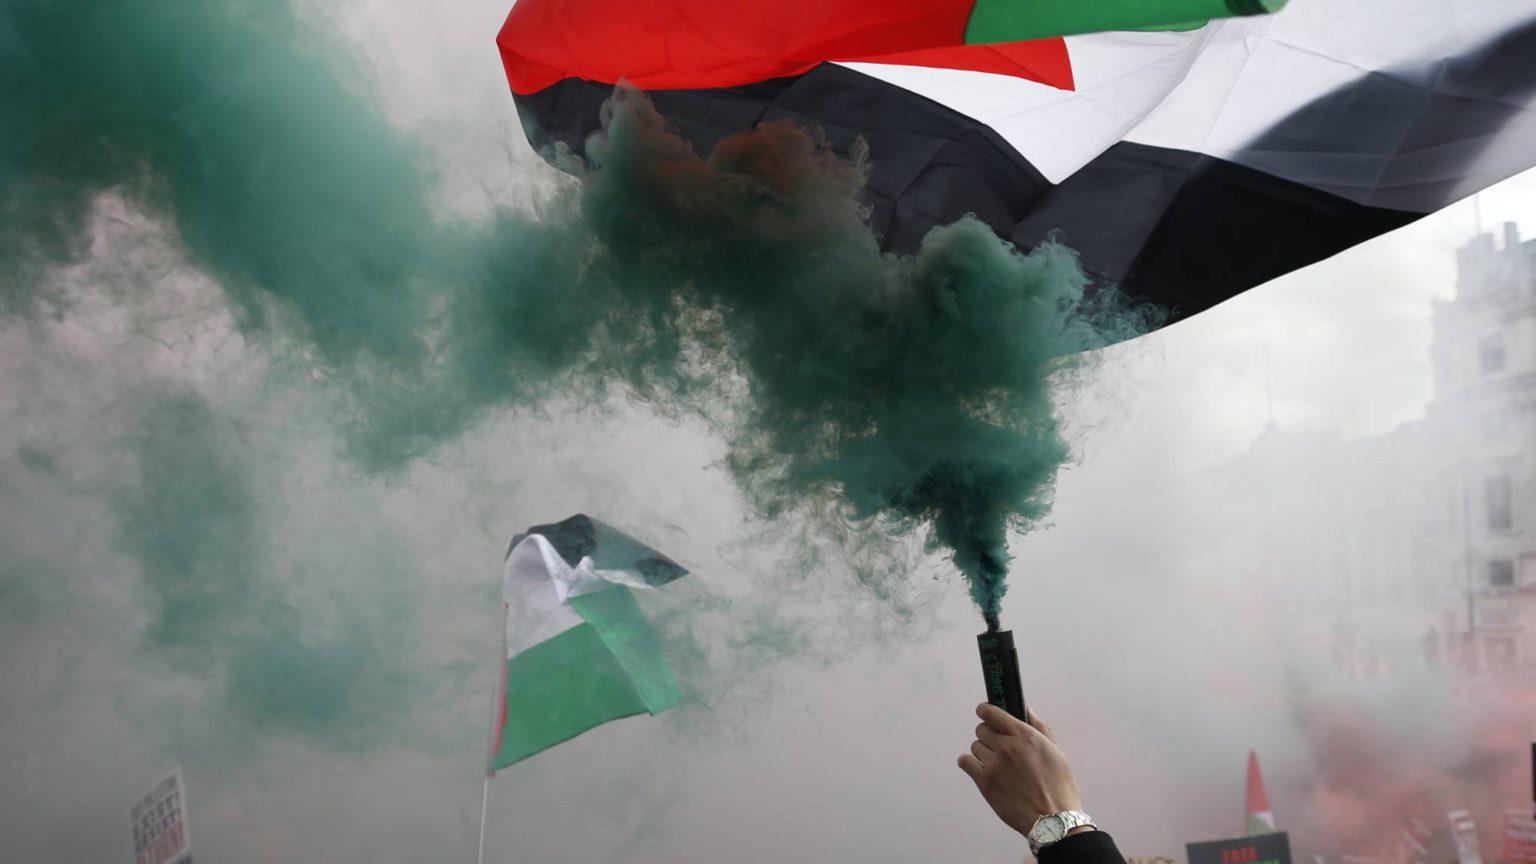 We cannot ignore Muslim anti-Semitism any longer